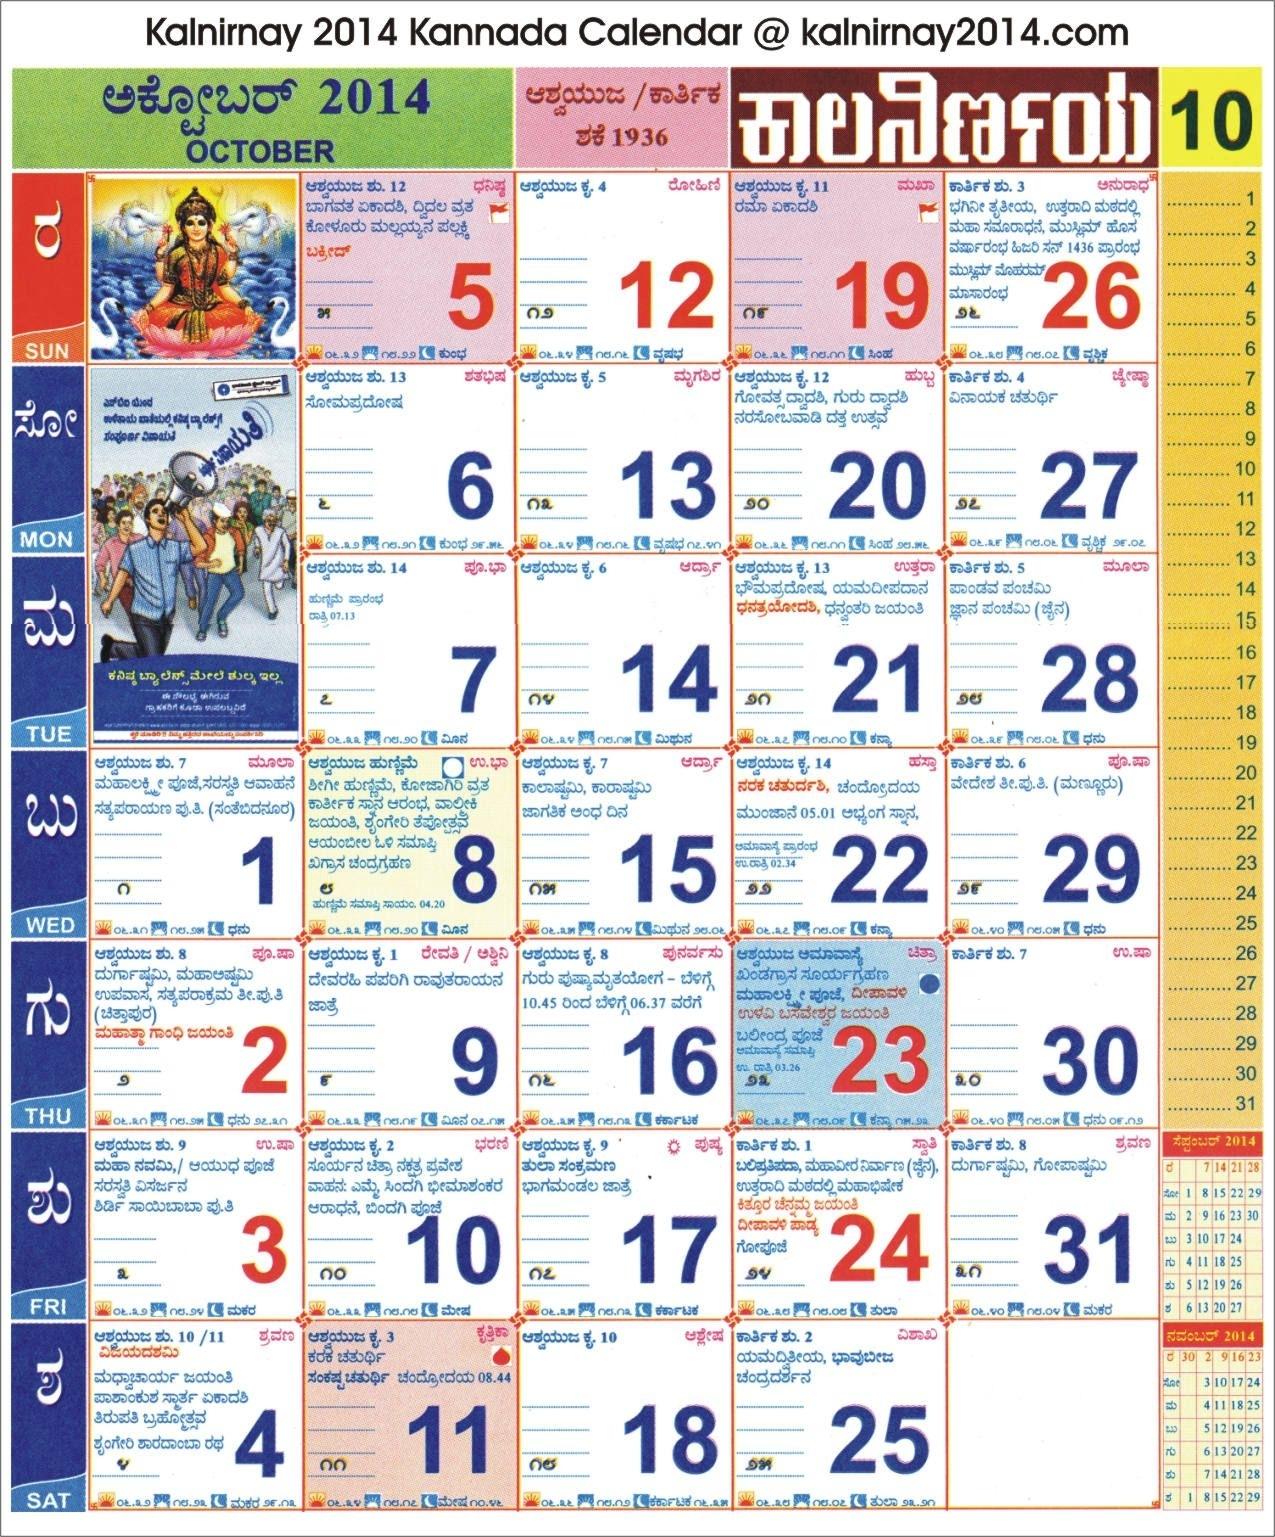 October 2014 Kannada Kalnirnay Calendar | 2014 Kannada